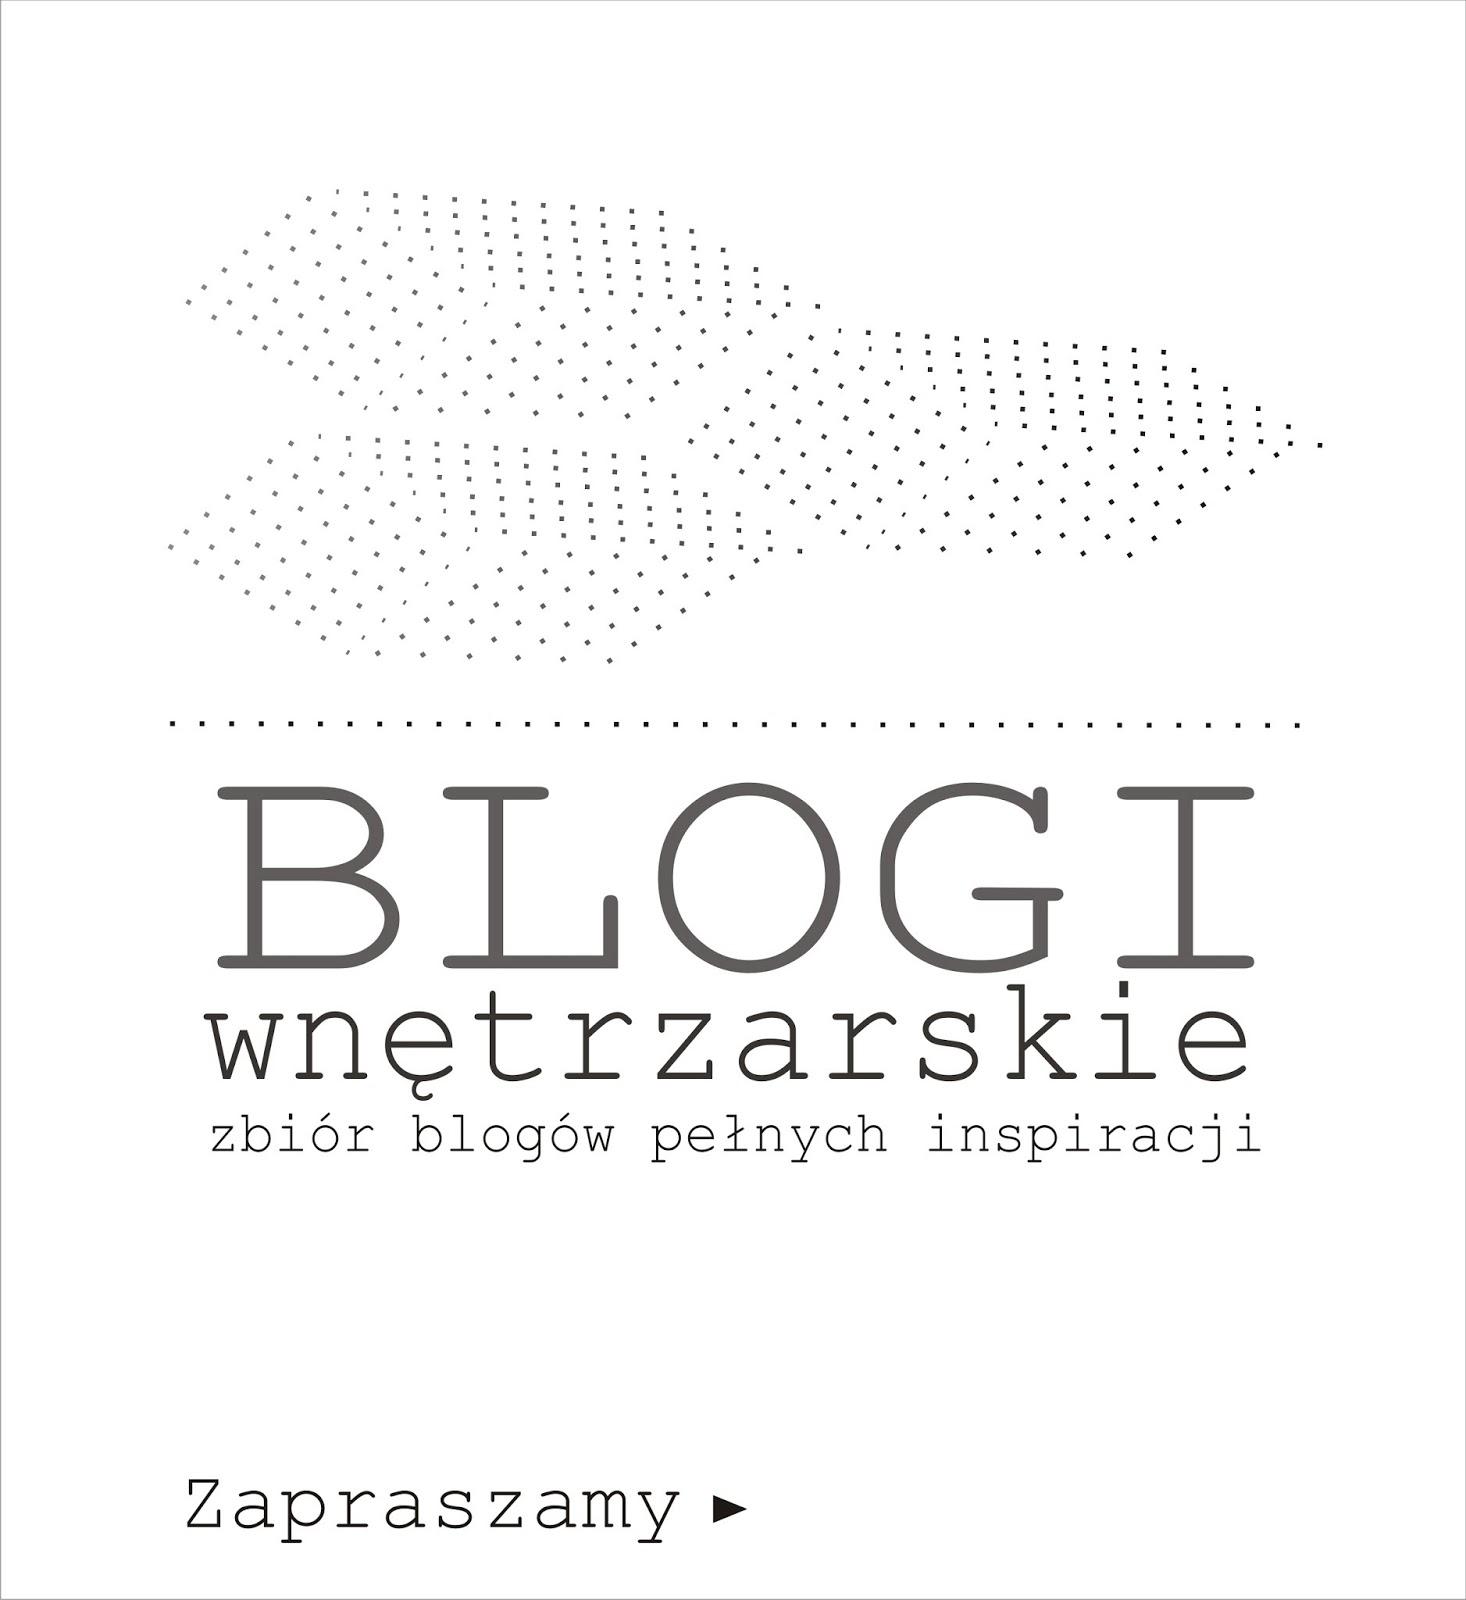 http://www.blogiwnetrzarskie.pl